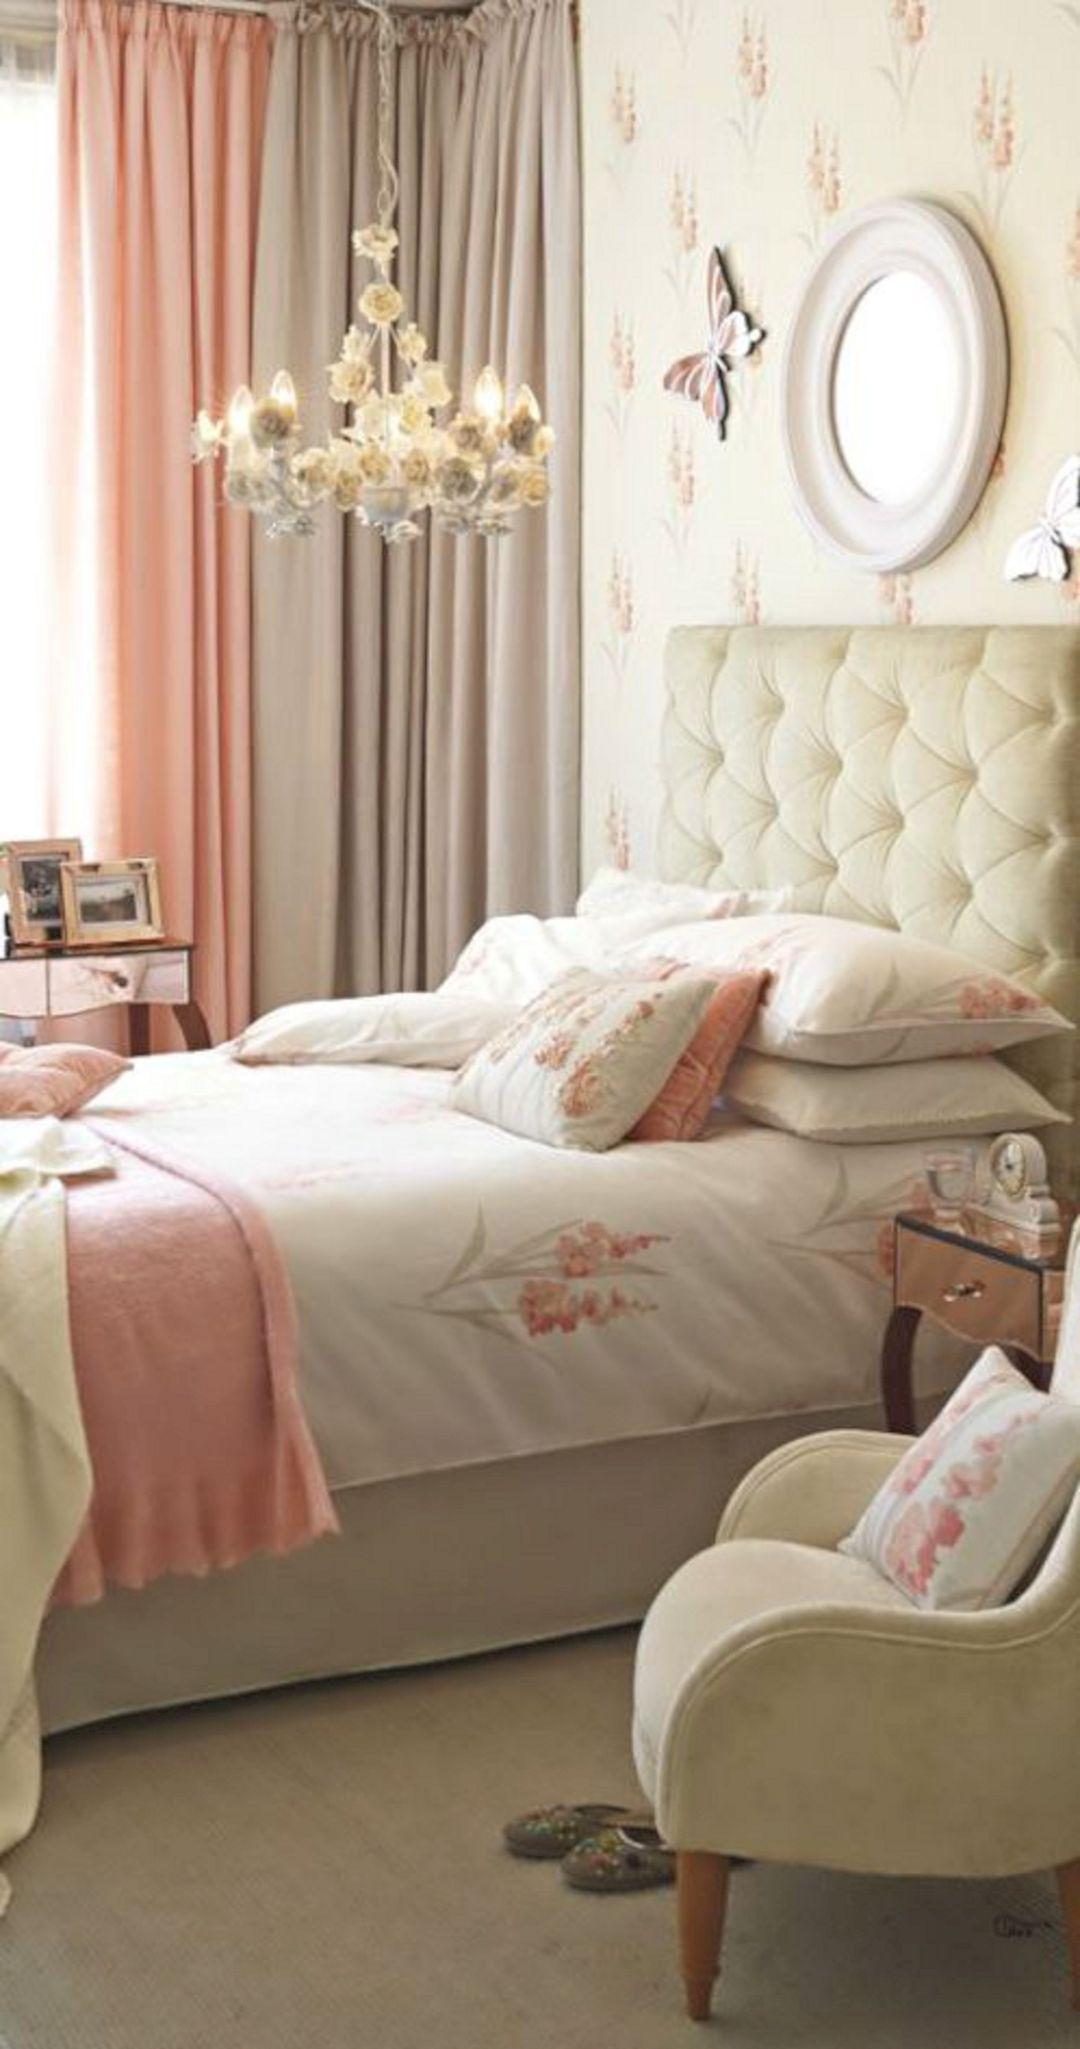 Peaches And Cream Bedroom 5 Peaches And Cream Bedroom 5